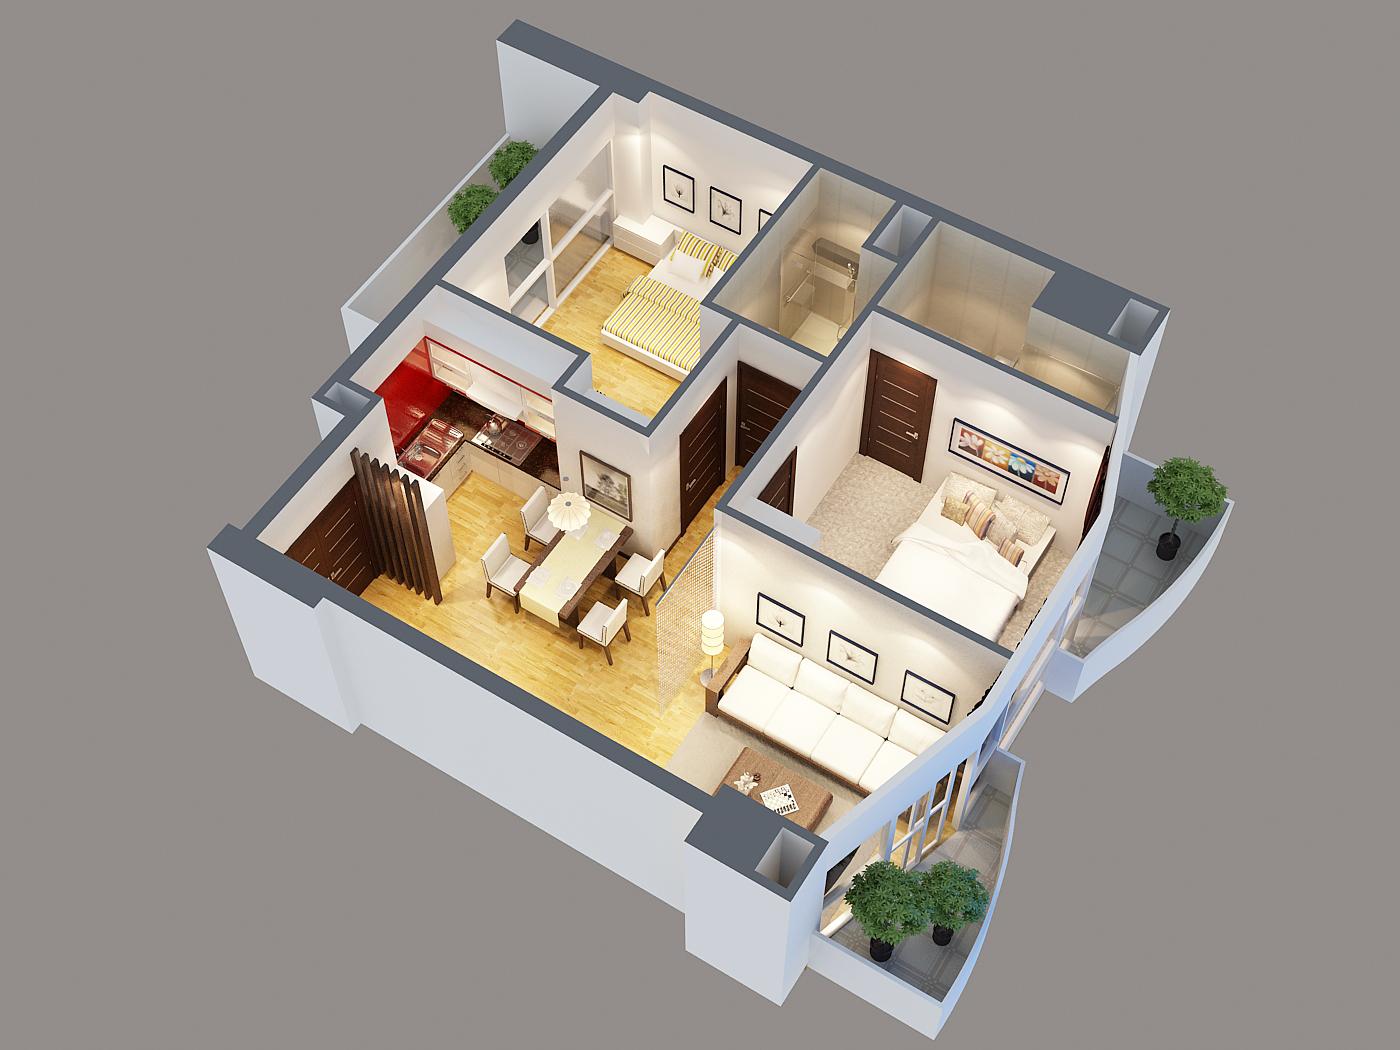 Detailed interior apartment 3d model 3d model buy for Apartment model house